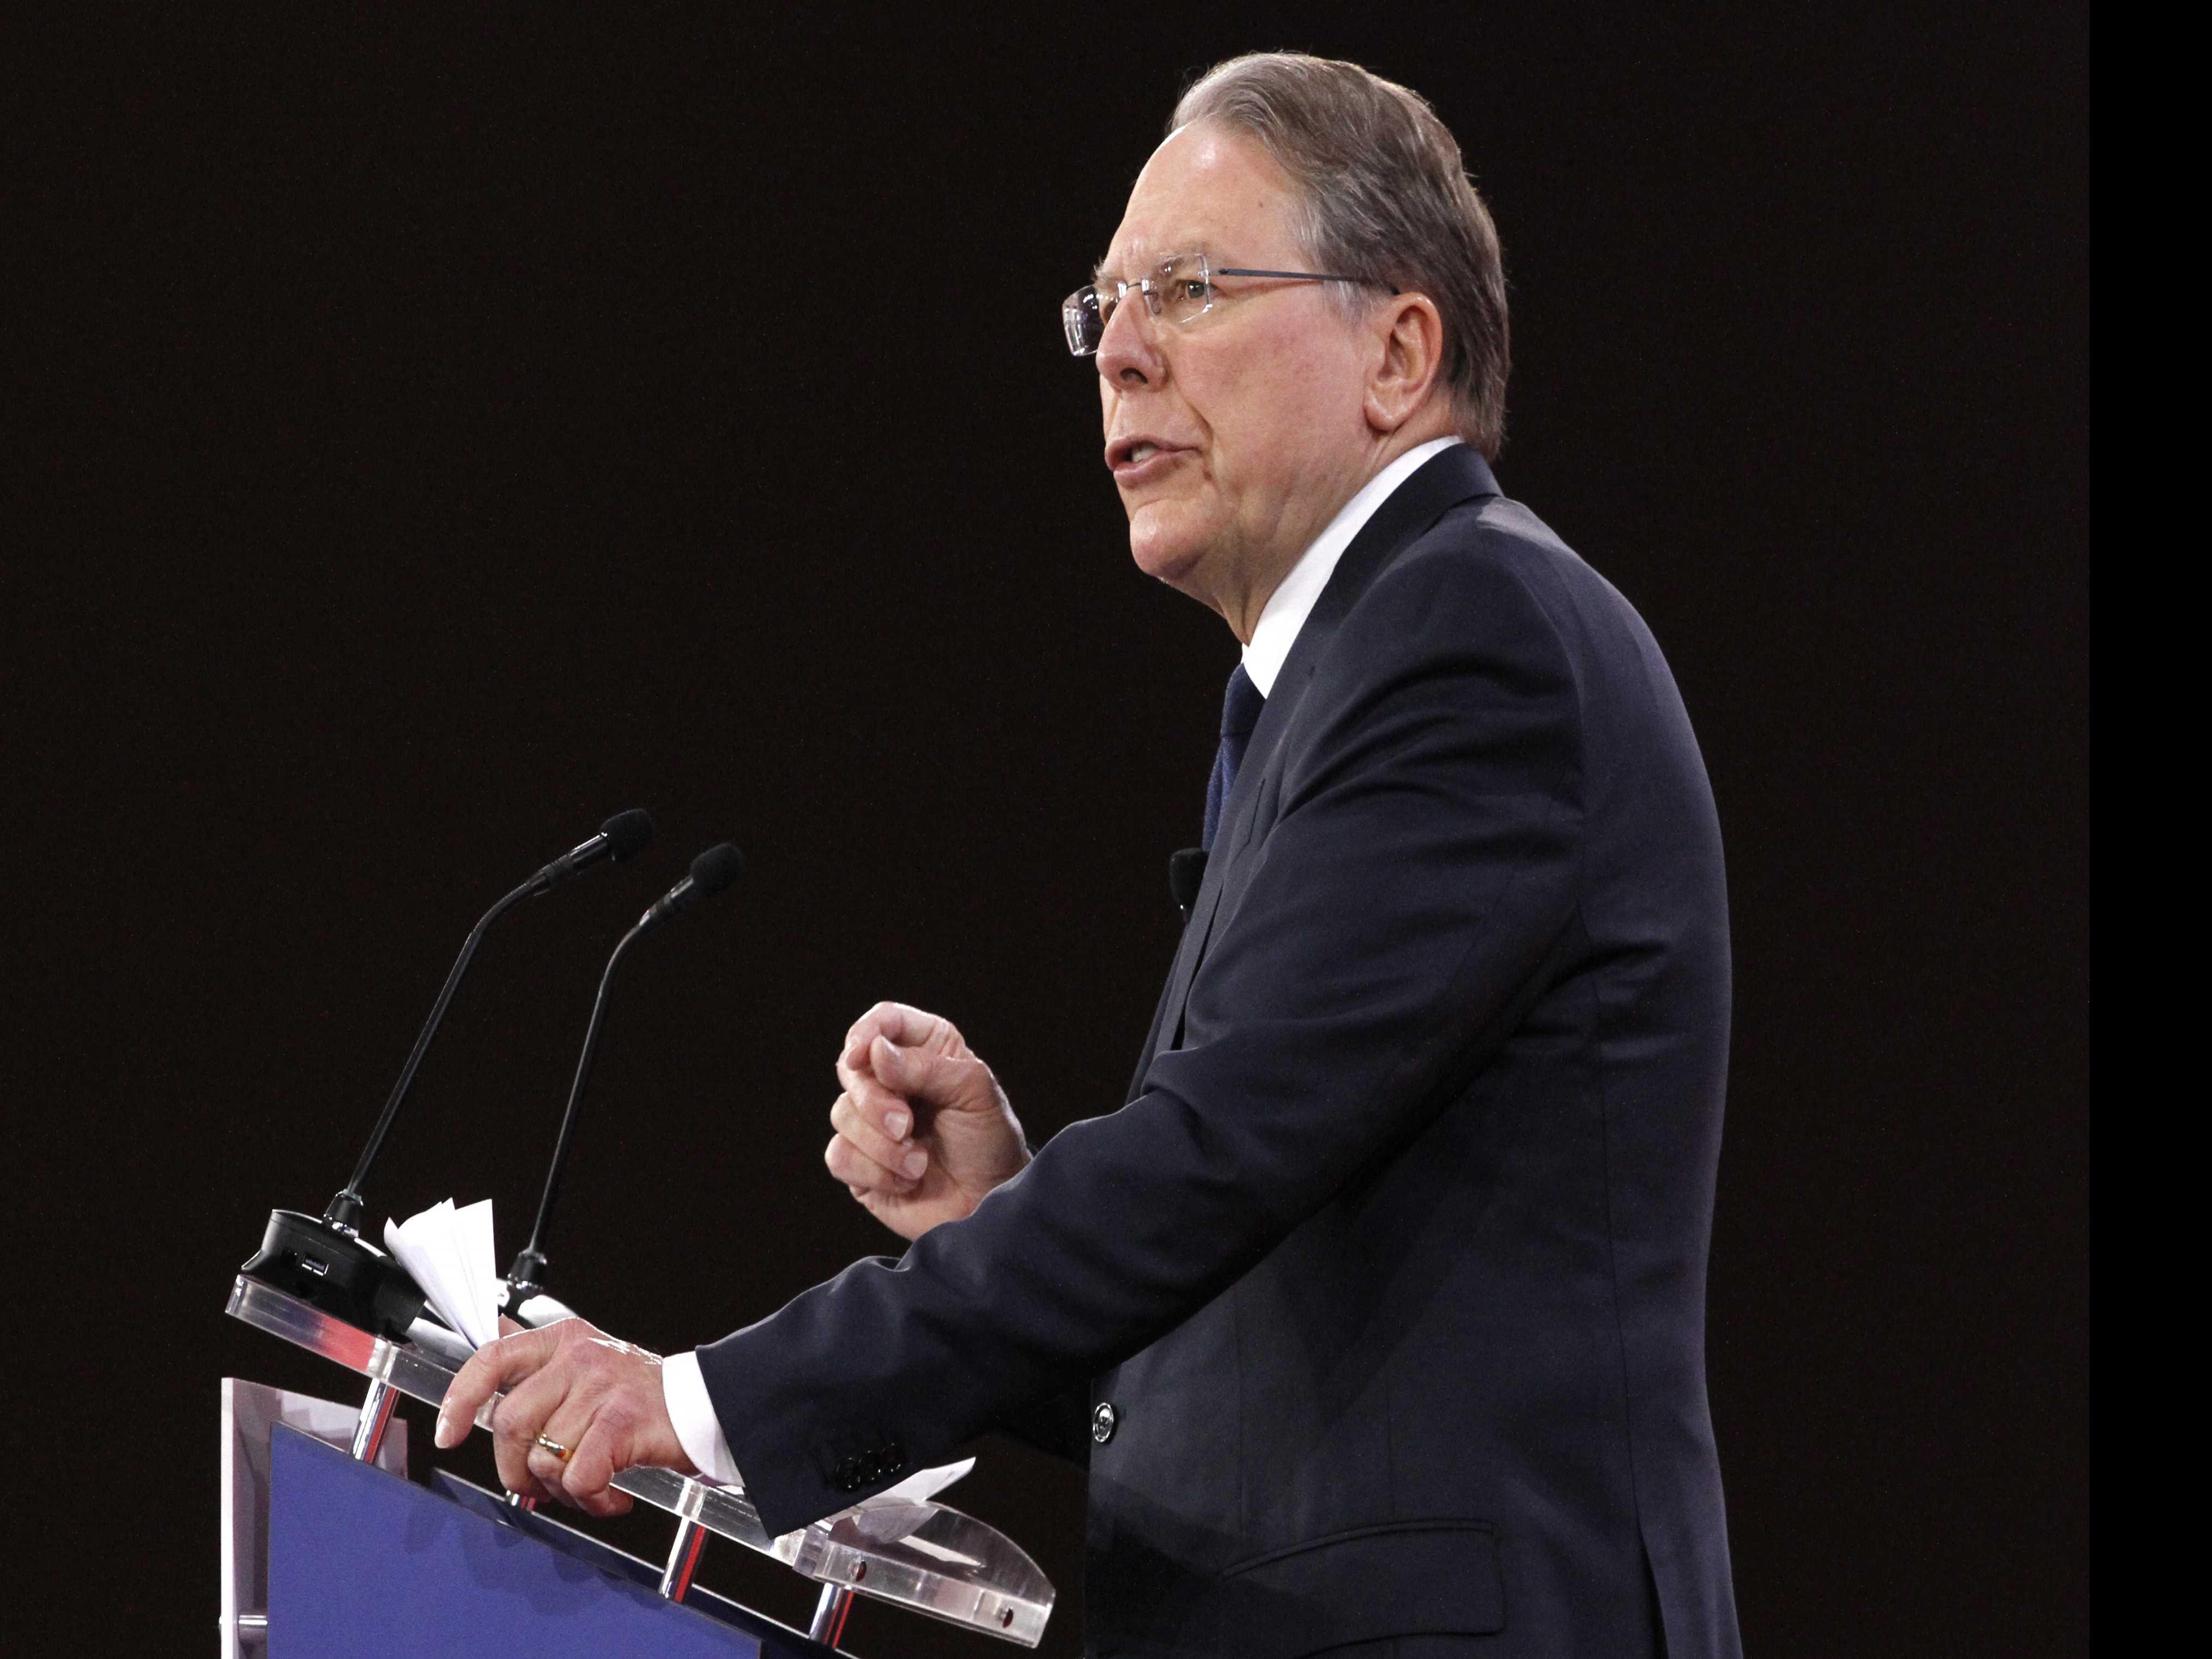 NRA Strikes a Defiant Tone, Criticizes Gun Control Advocates